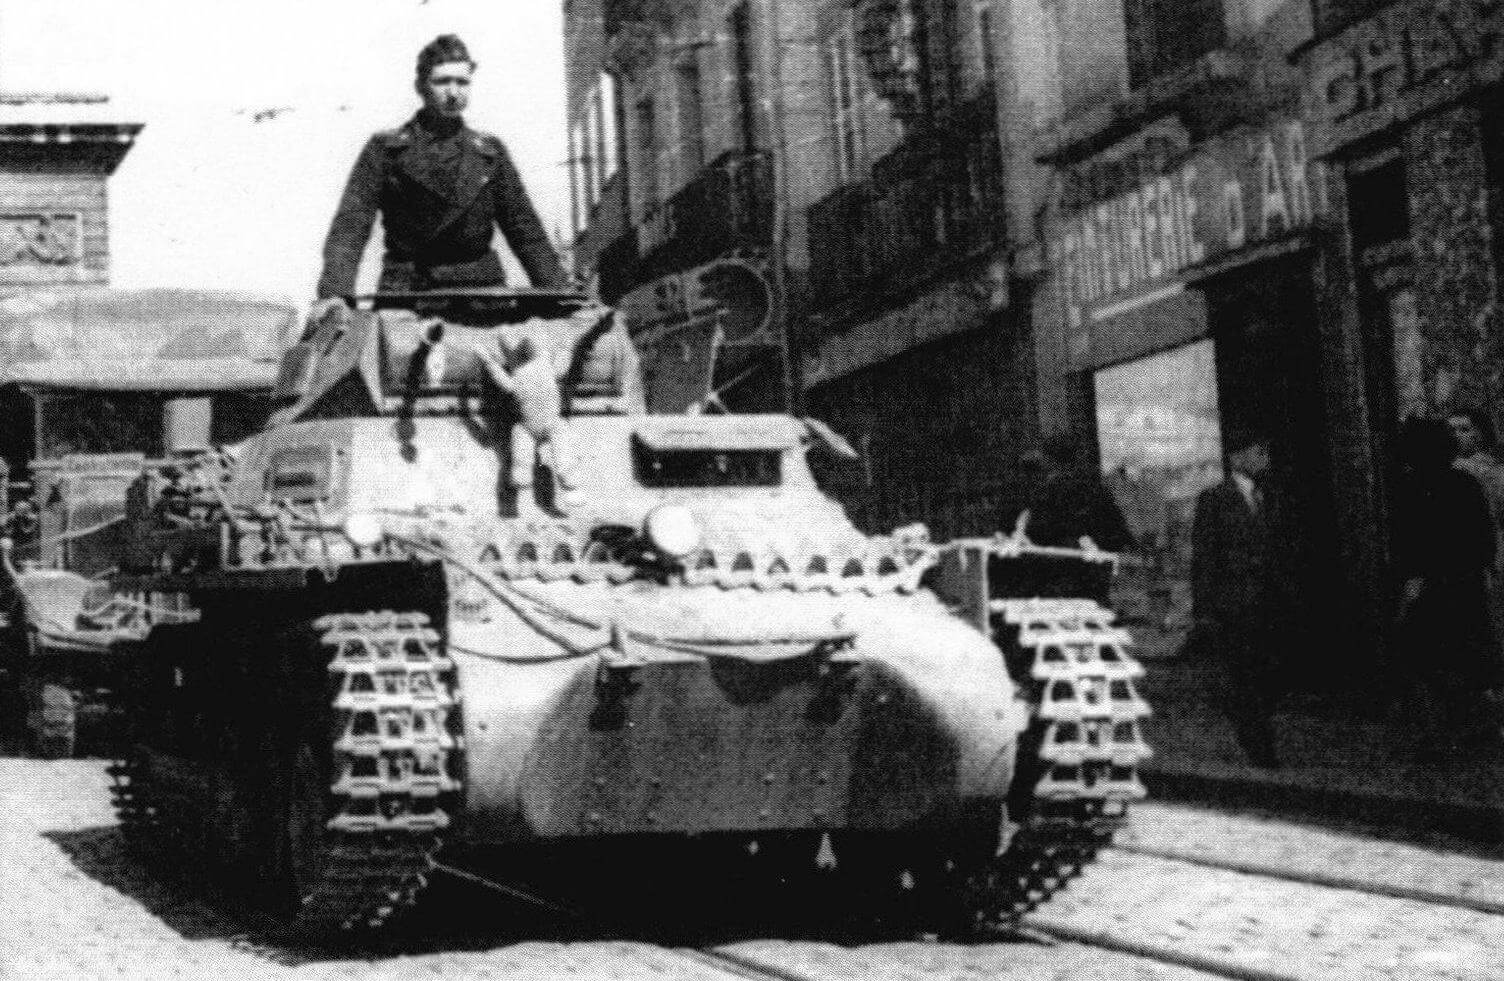 Так все начиналось. Pz.I Ausf.B на улице Парижа. Июнь 1940 года